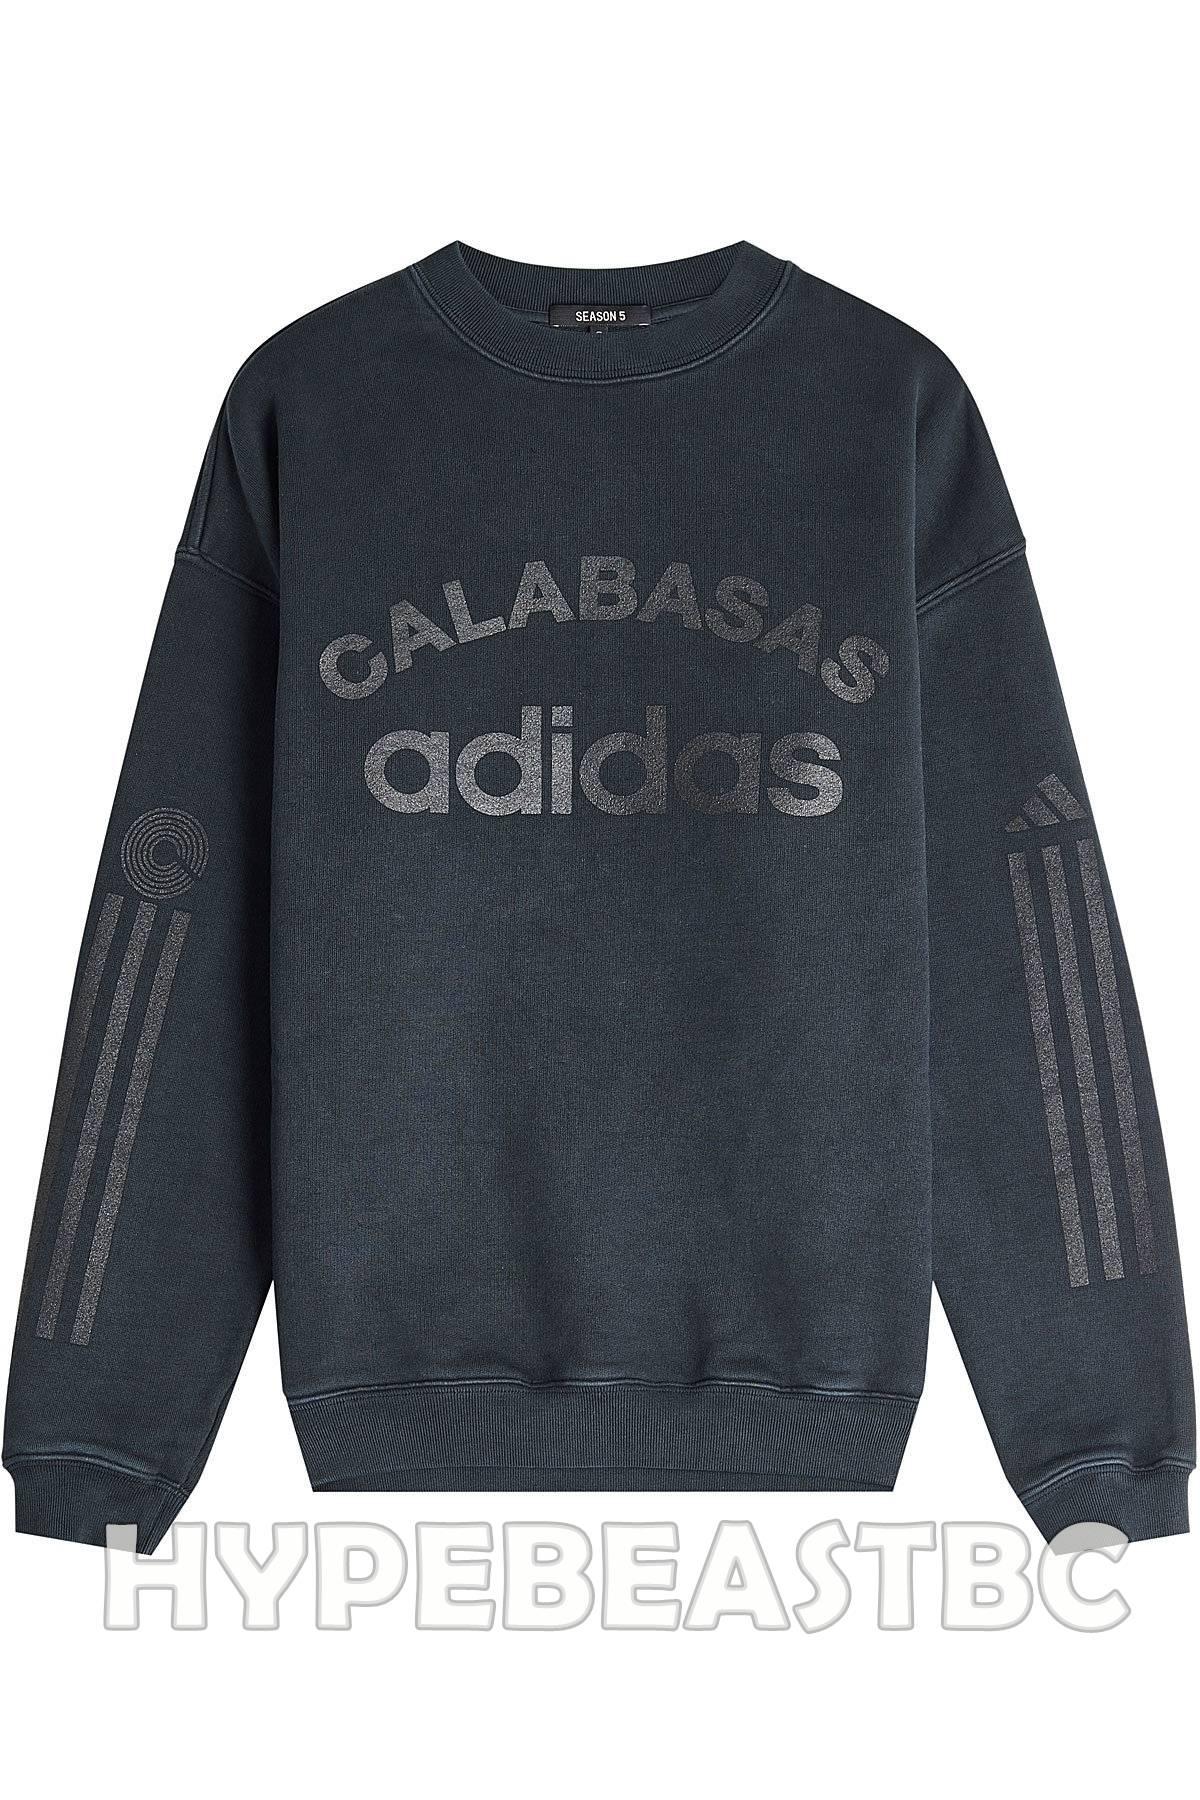 b0a80e4a9 Adidas × Adidas Kanye West × Yeezy Season ×. YEEZY Calabasas Adidas Sweatshirt  Season 5 Cotton Sweater ...